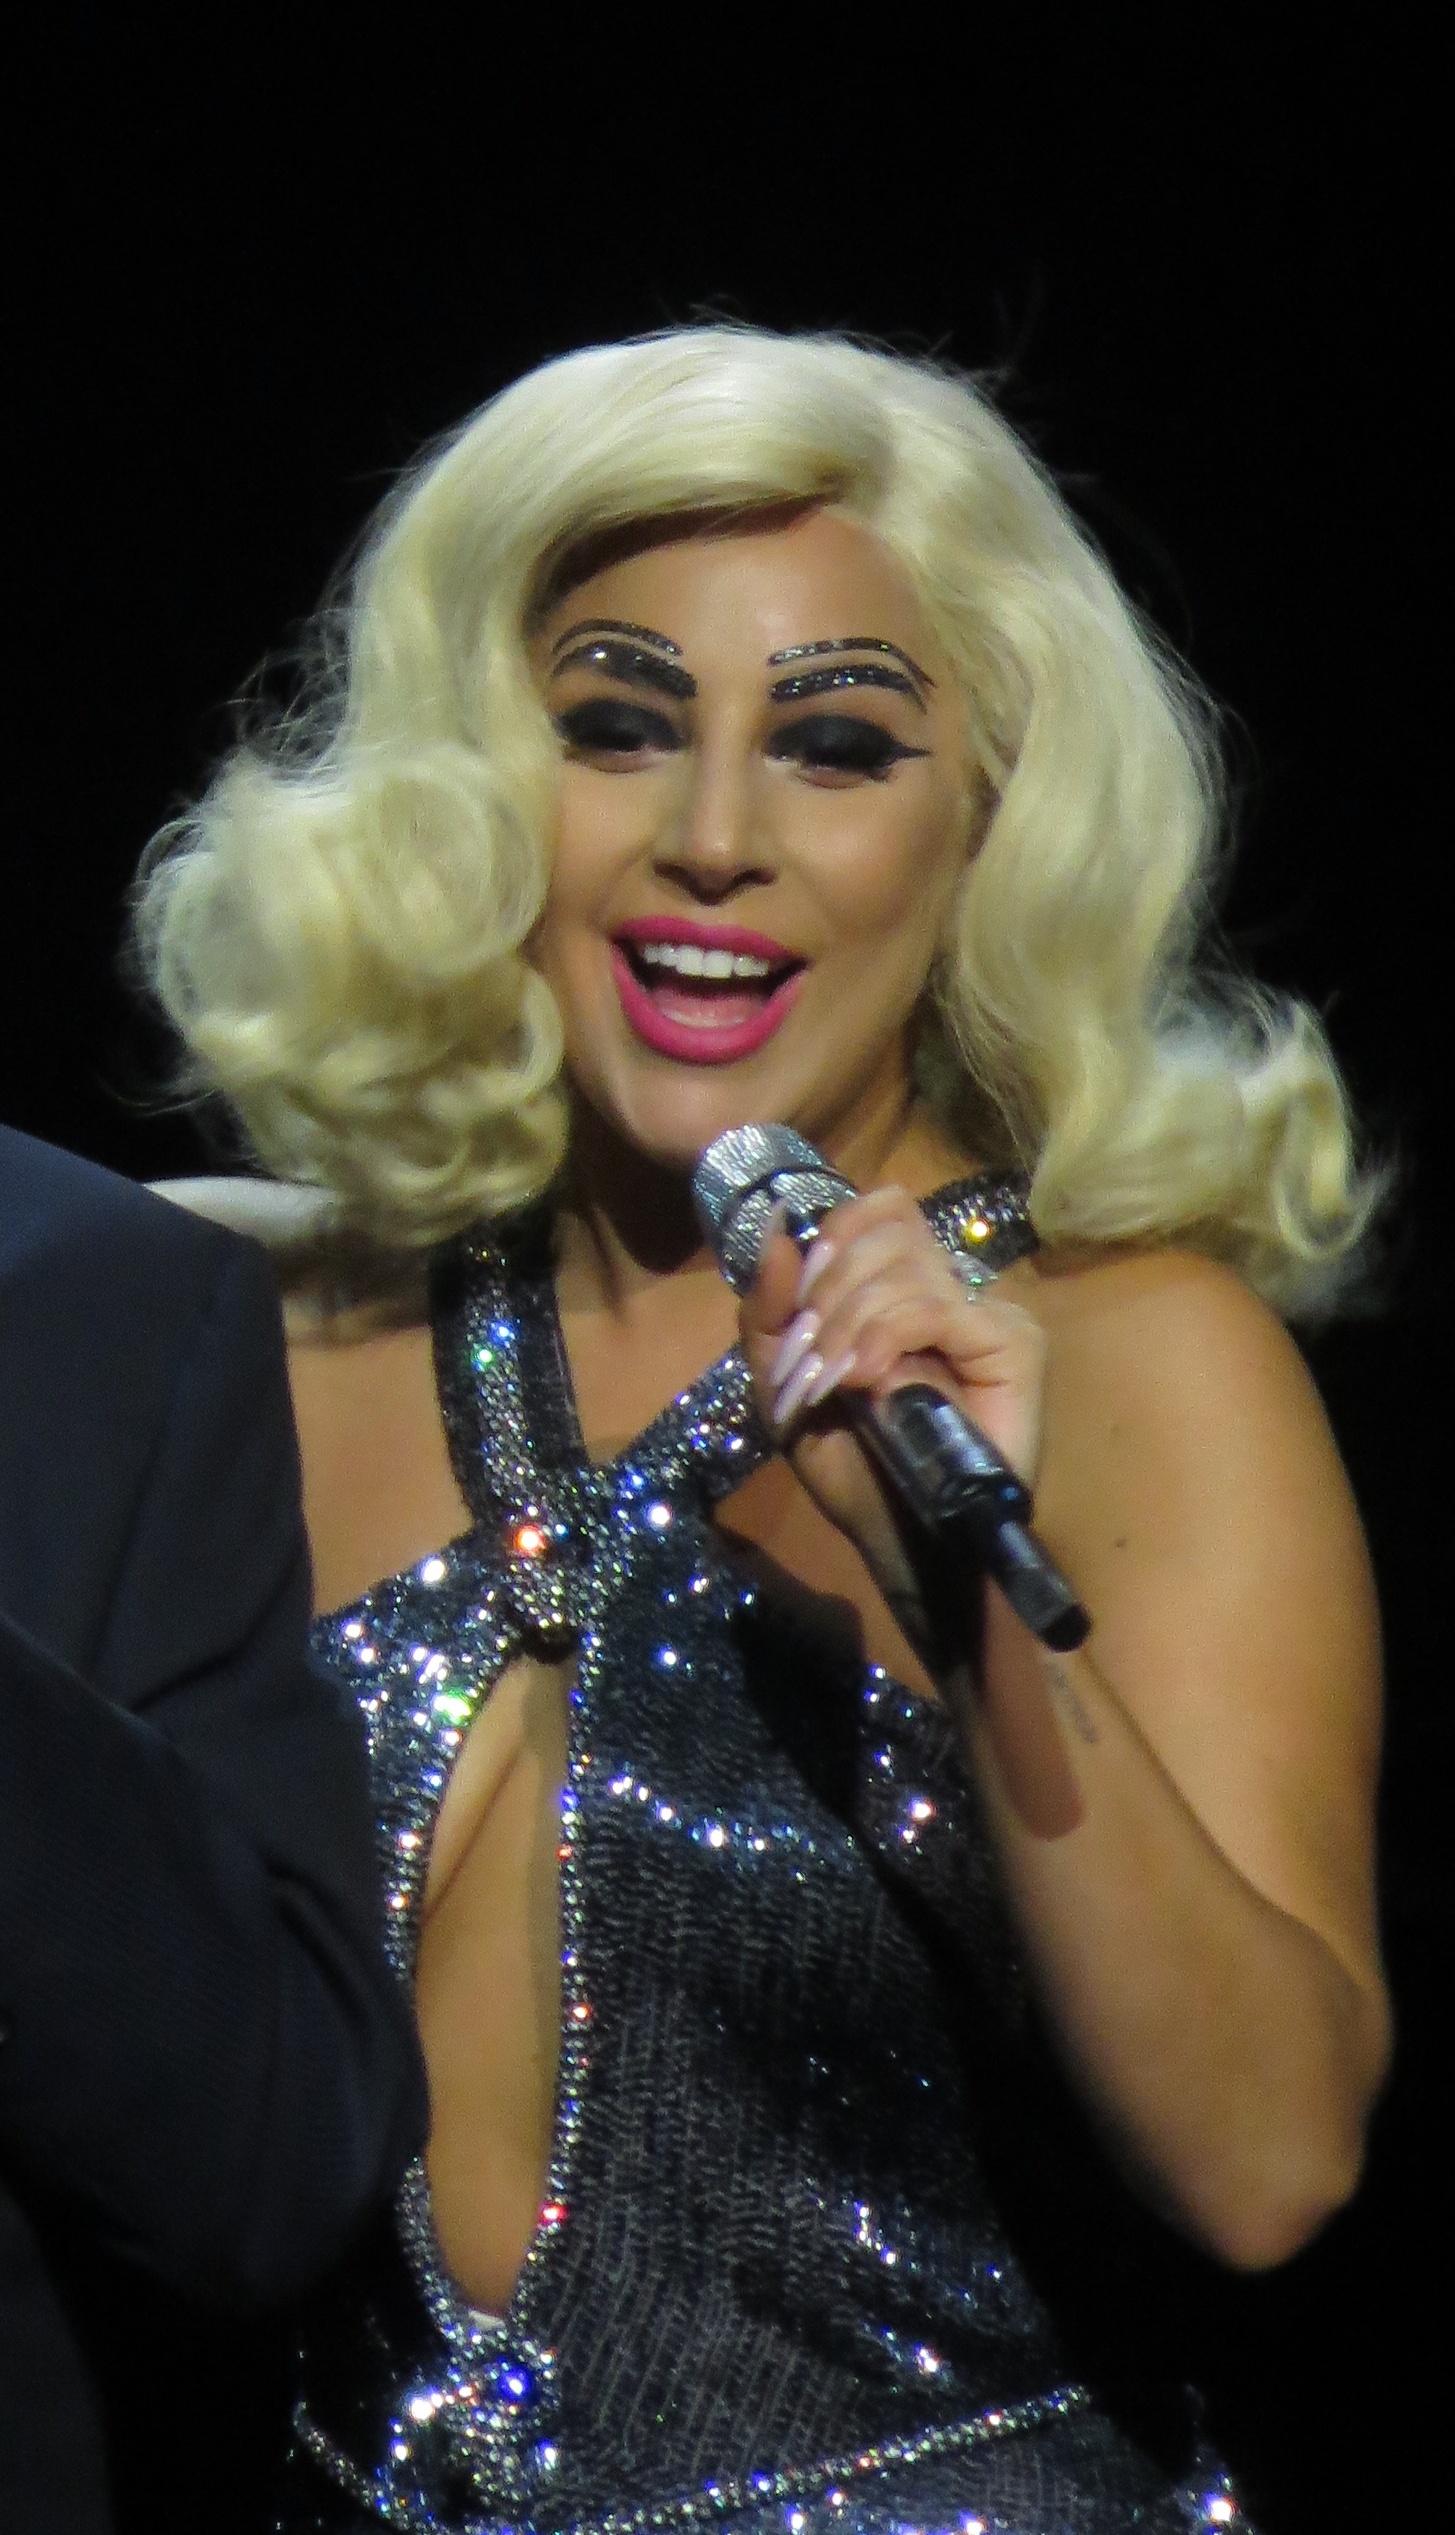 Description Tony Bennett & Lady GaGa, Cheek to Cheek Tour 08 (cropped ... Lady Gaga